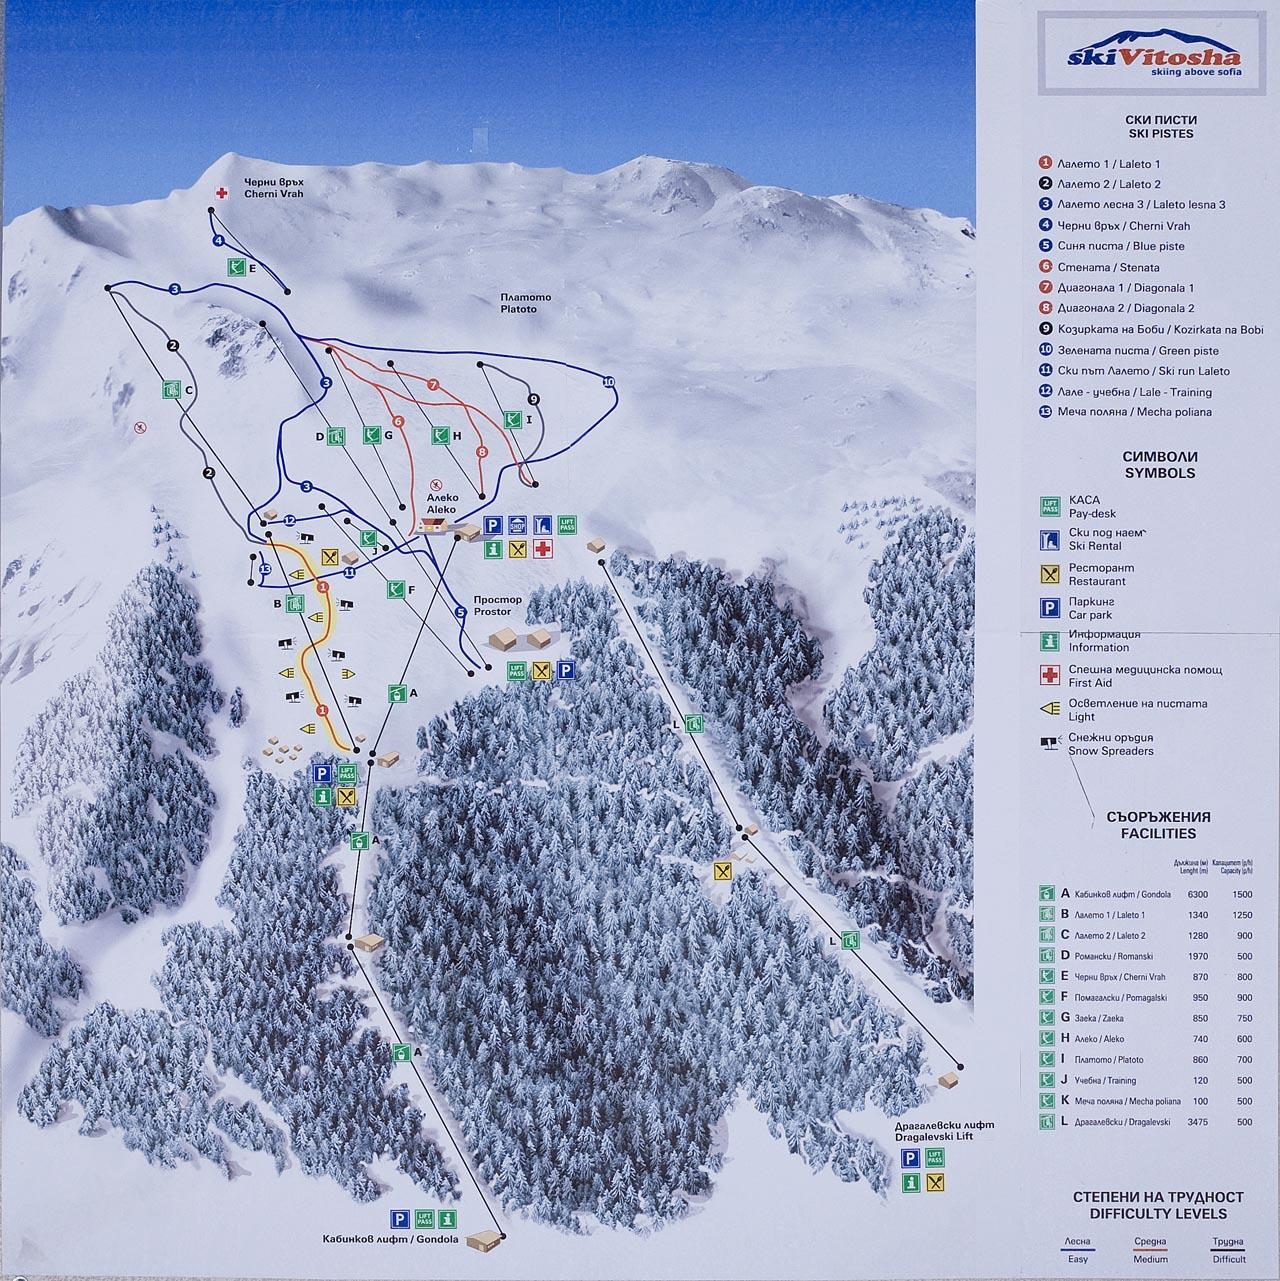 Vitosha - Ski map - piste, slopes, lifts